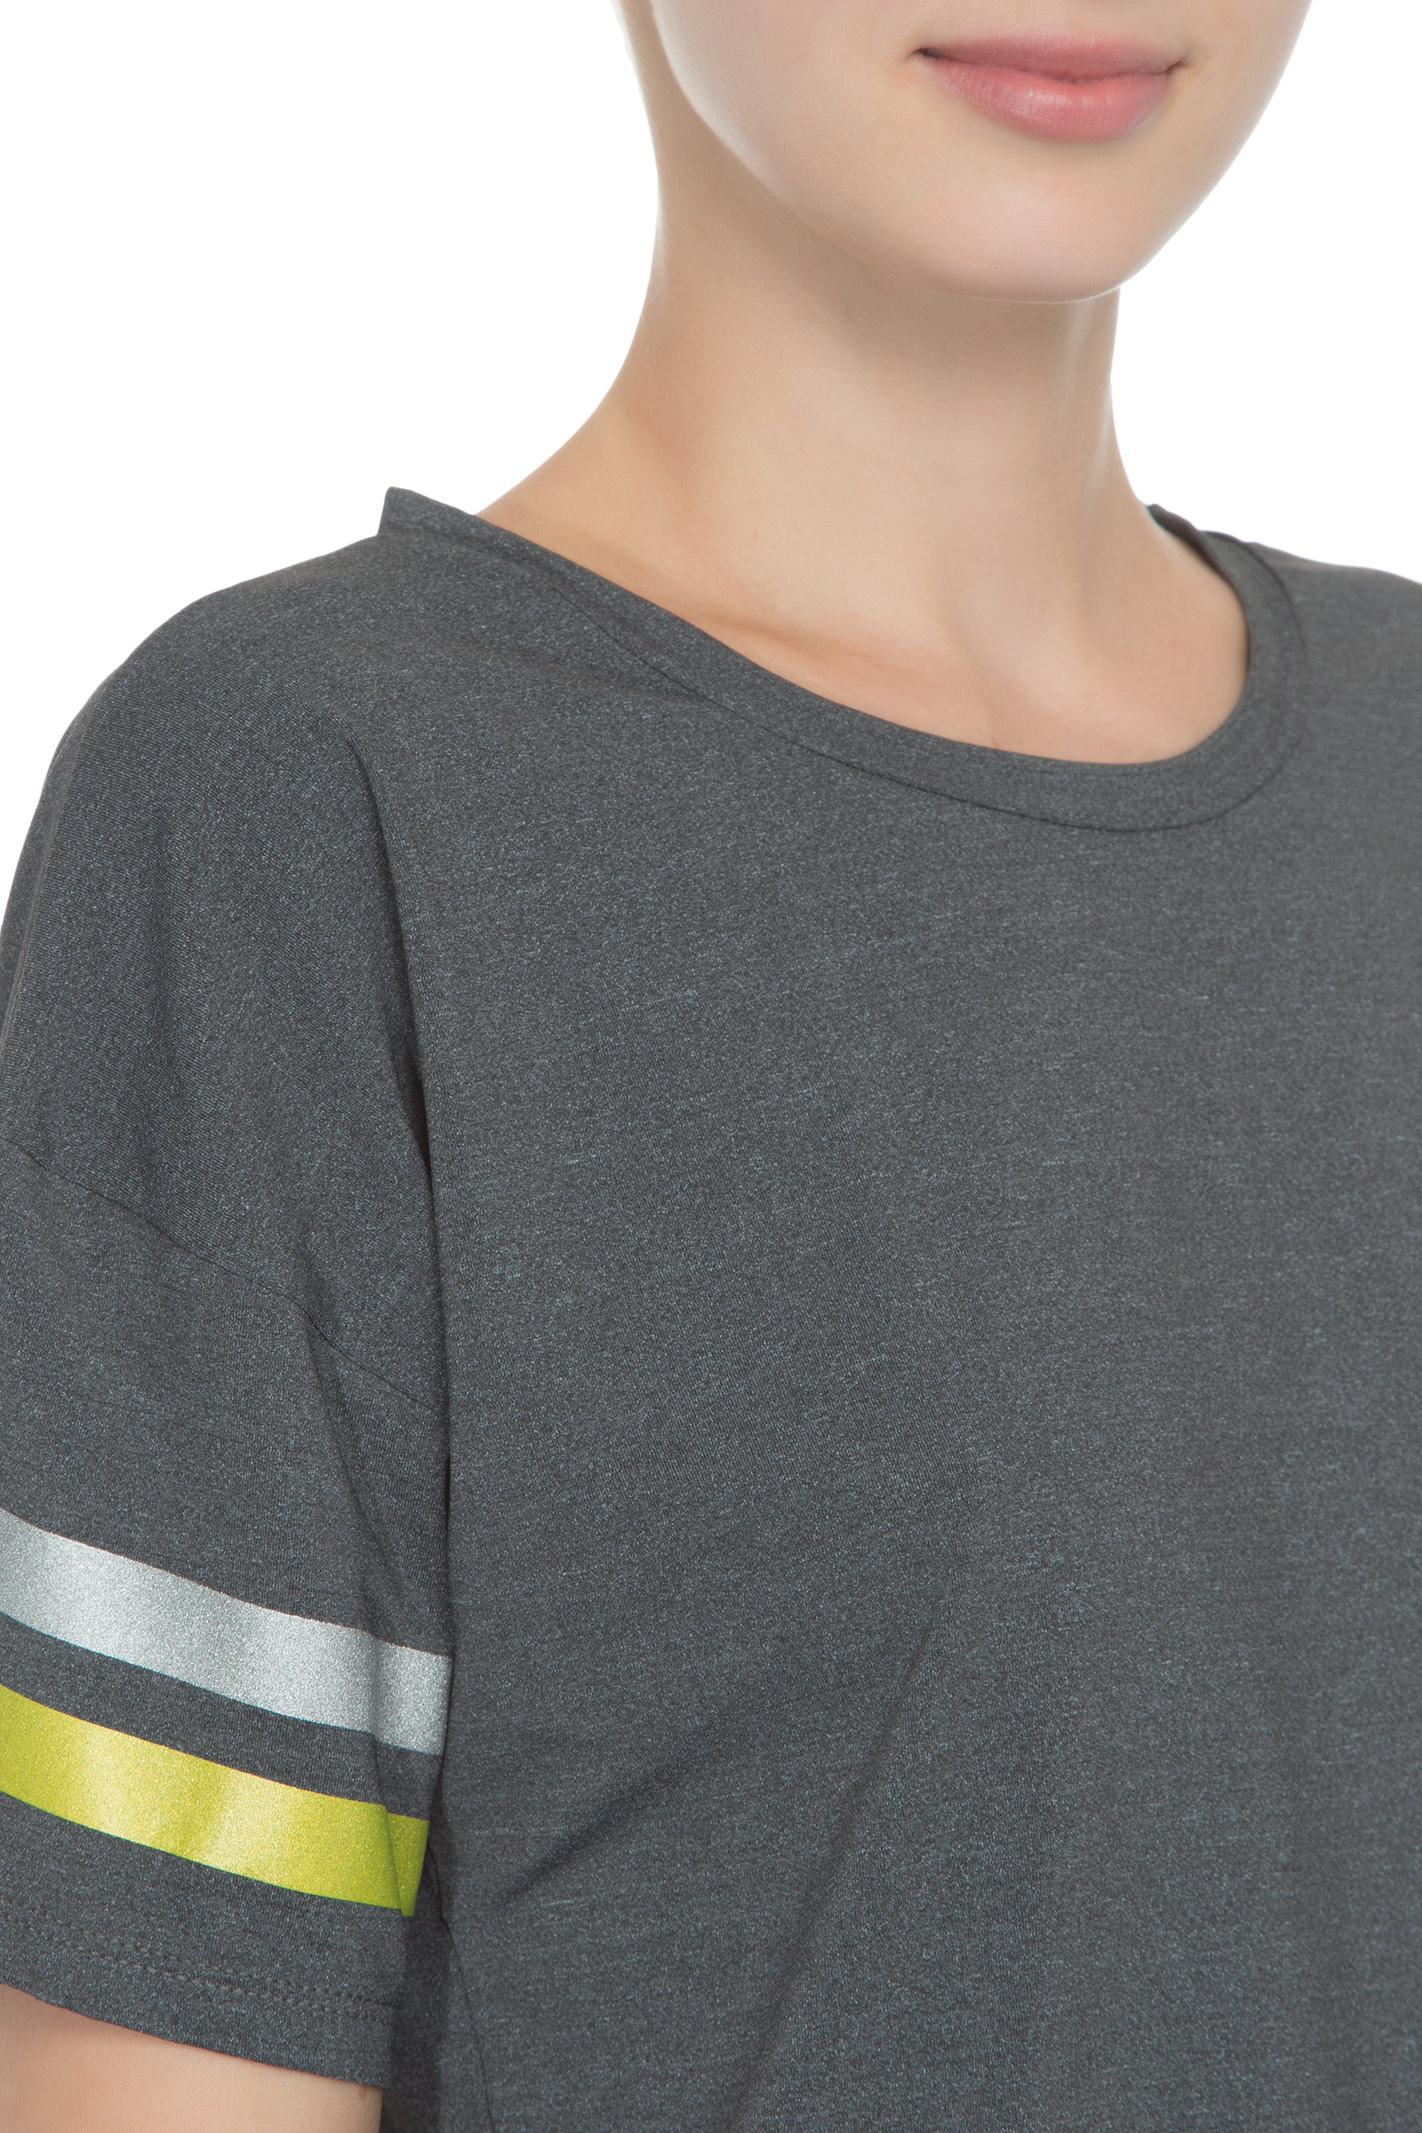 Camiseta Manga Curta Estampa Metalizada - Cinza